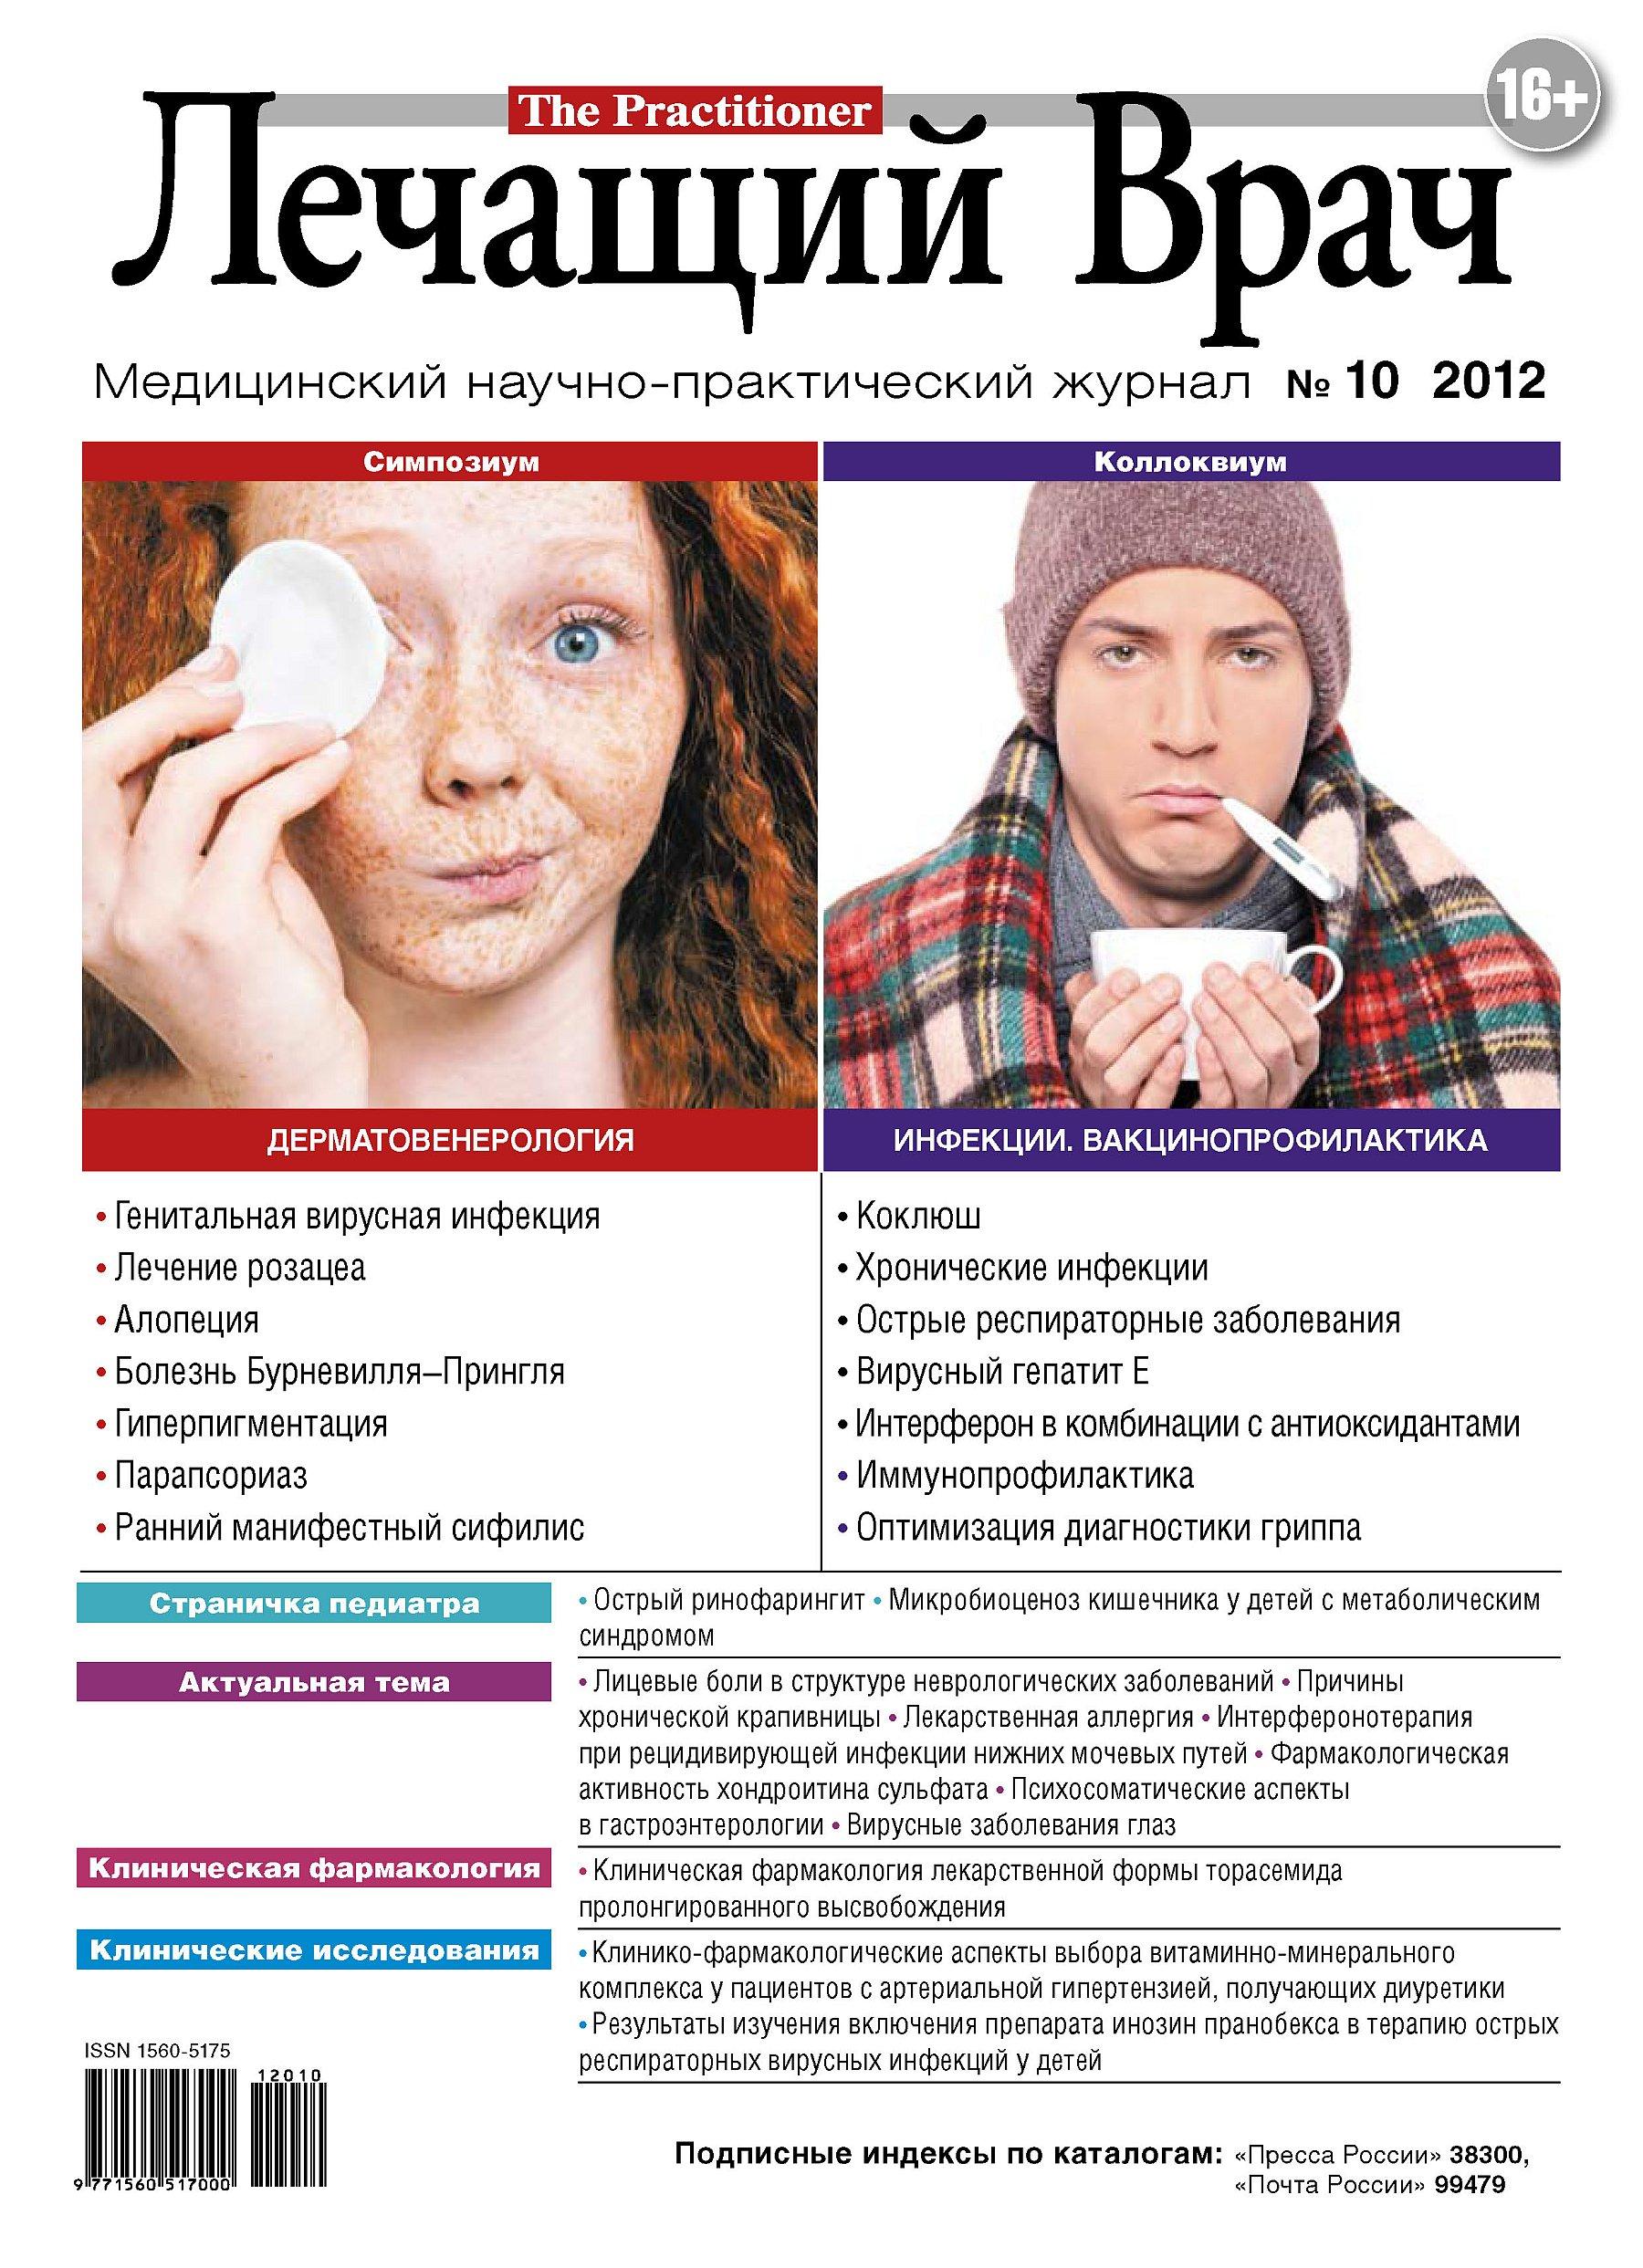 Журнал «Лечащий Врач» №10/2012